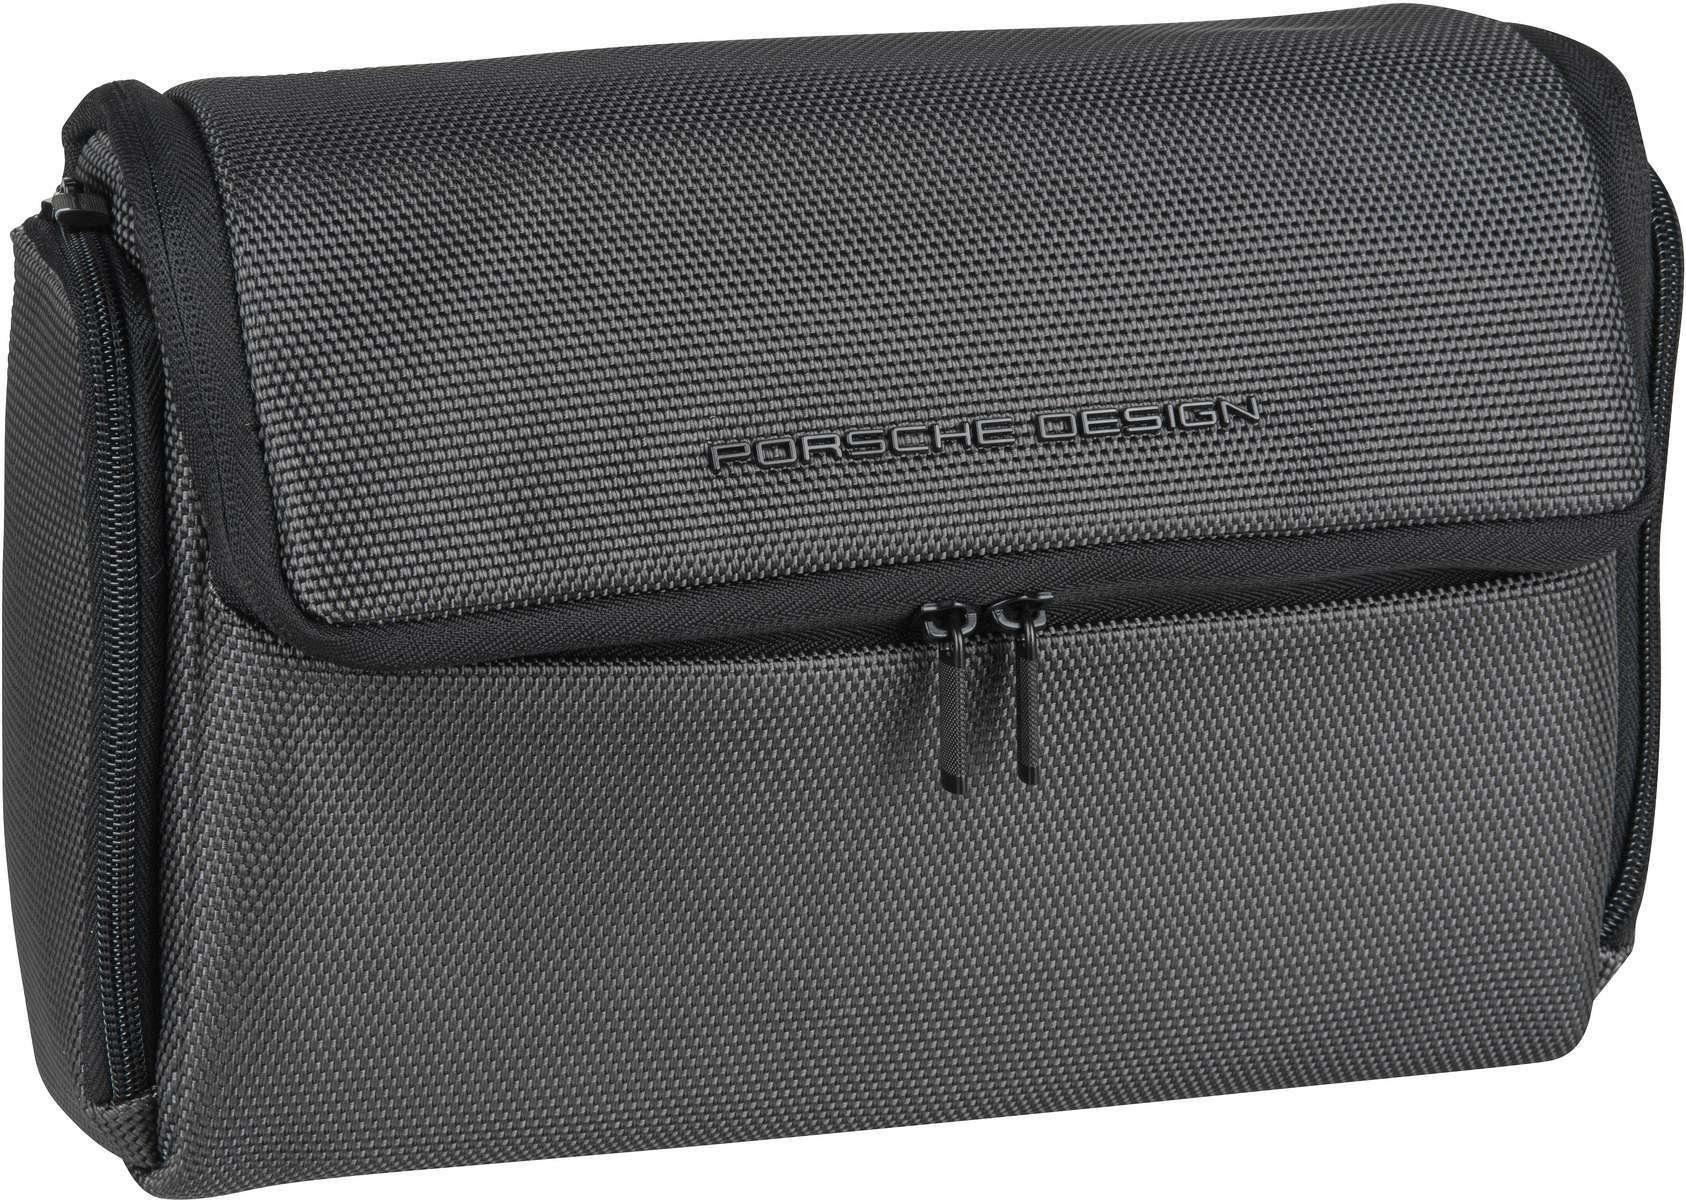 Unisex PORSCHE Design Kulturbeutel / Beauty Case »Roadster 4.1 WashBag MHF« grau | 04053533749010